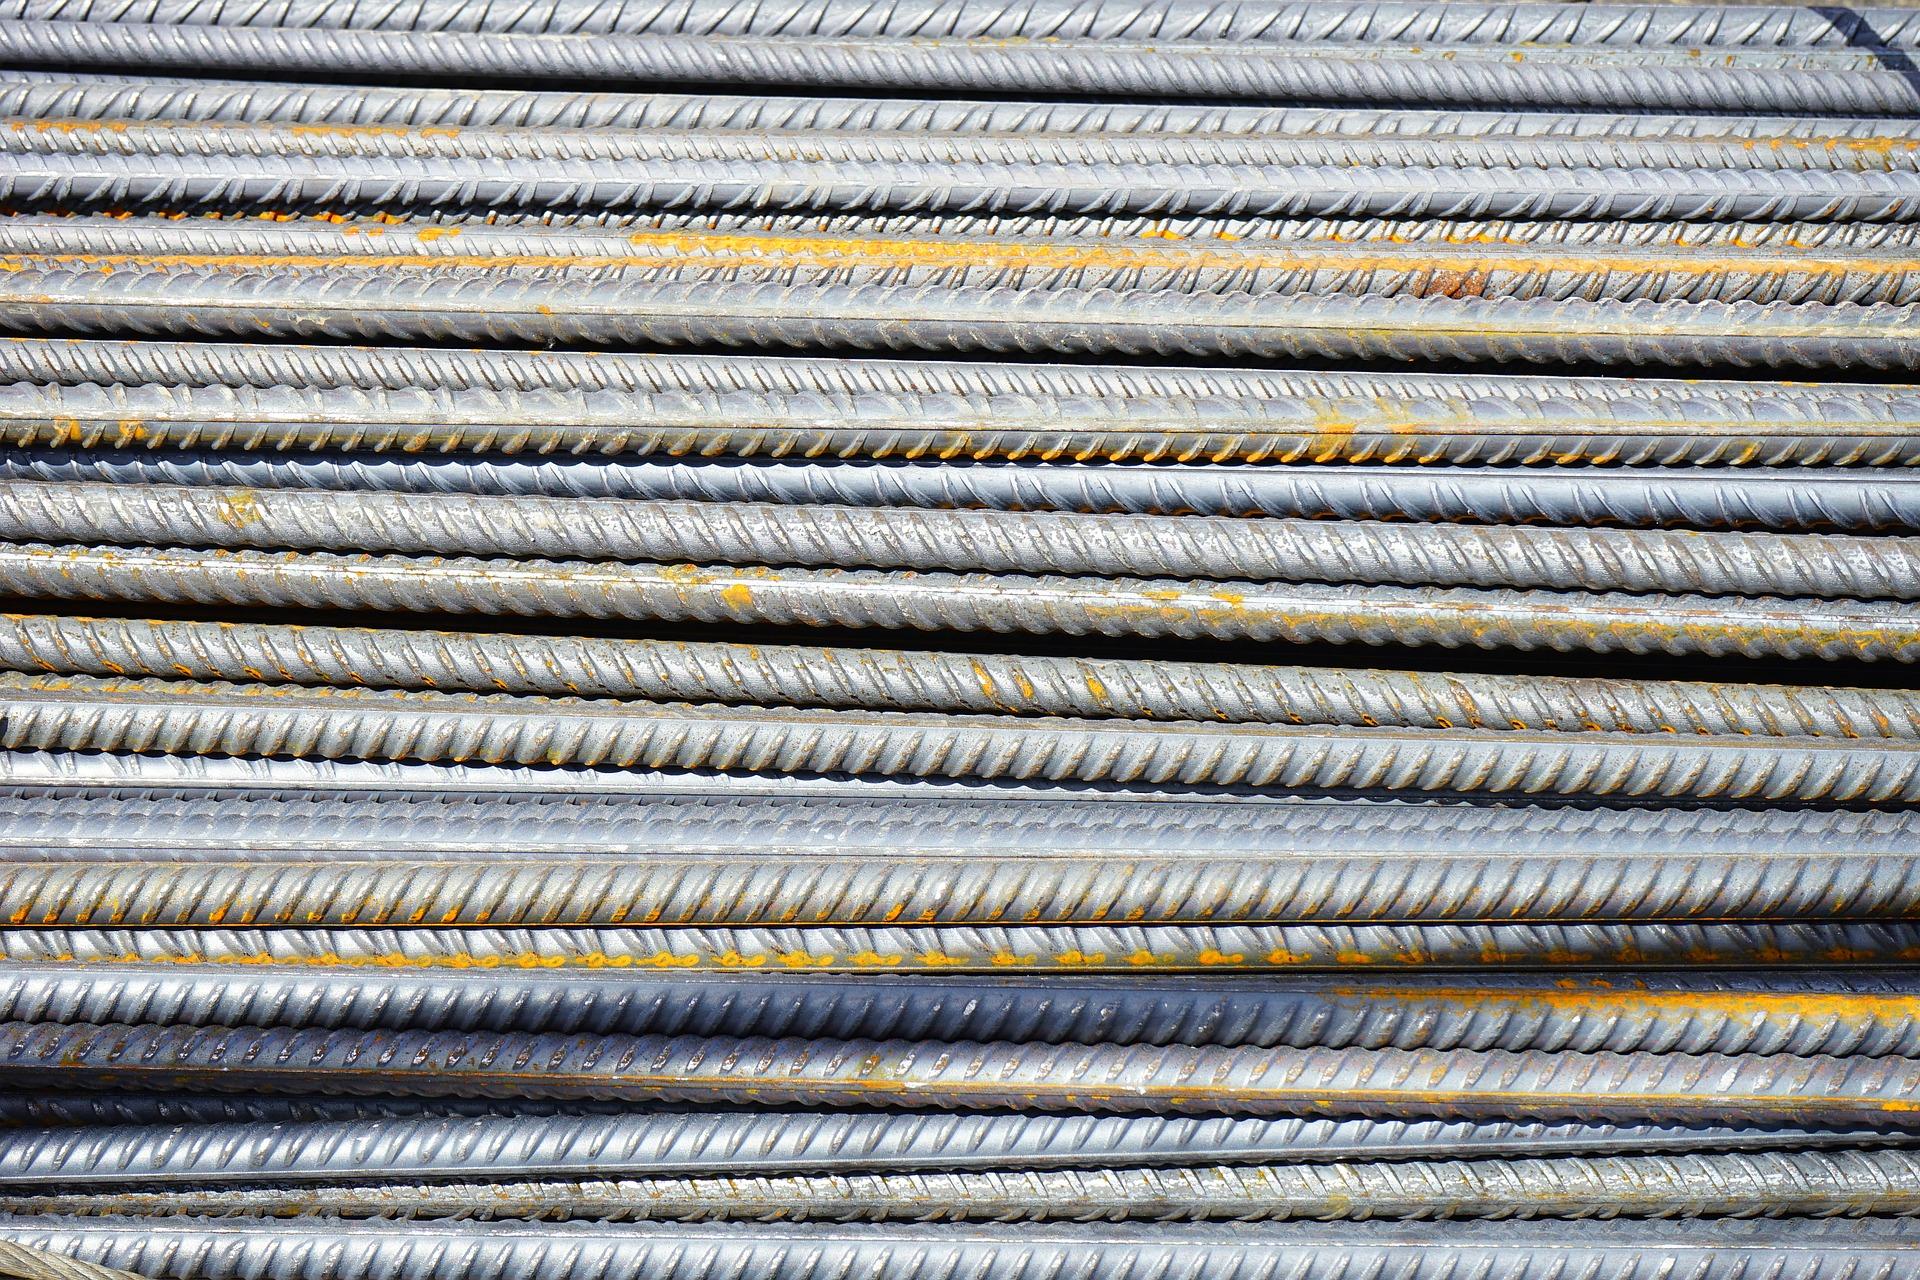 iron rods rebar